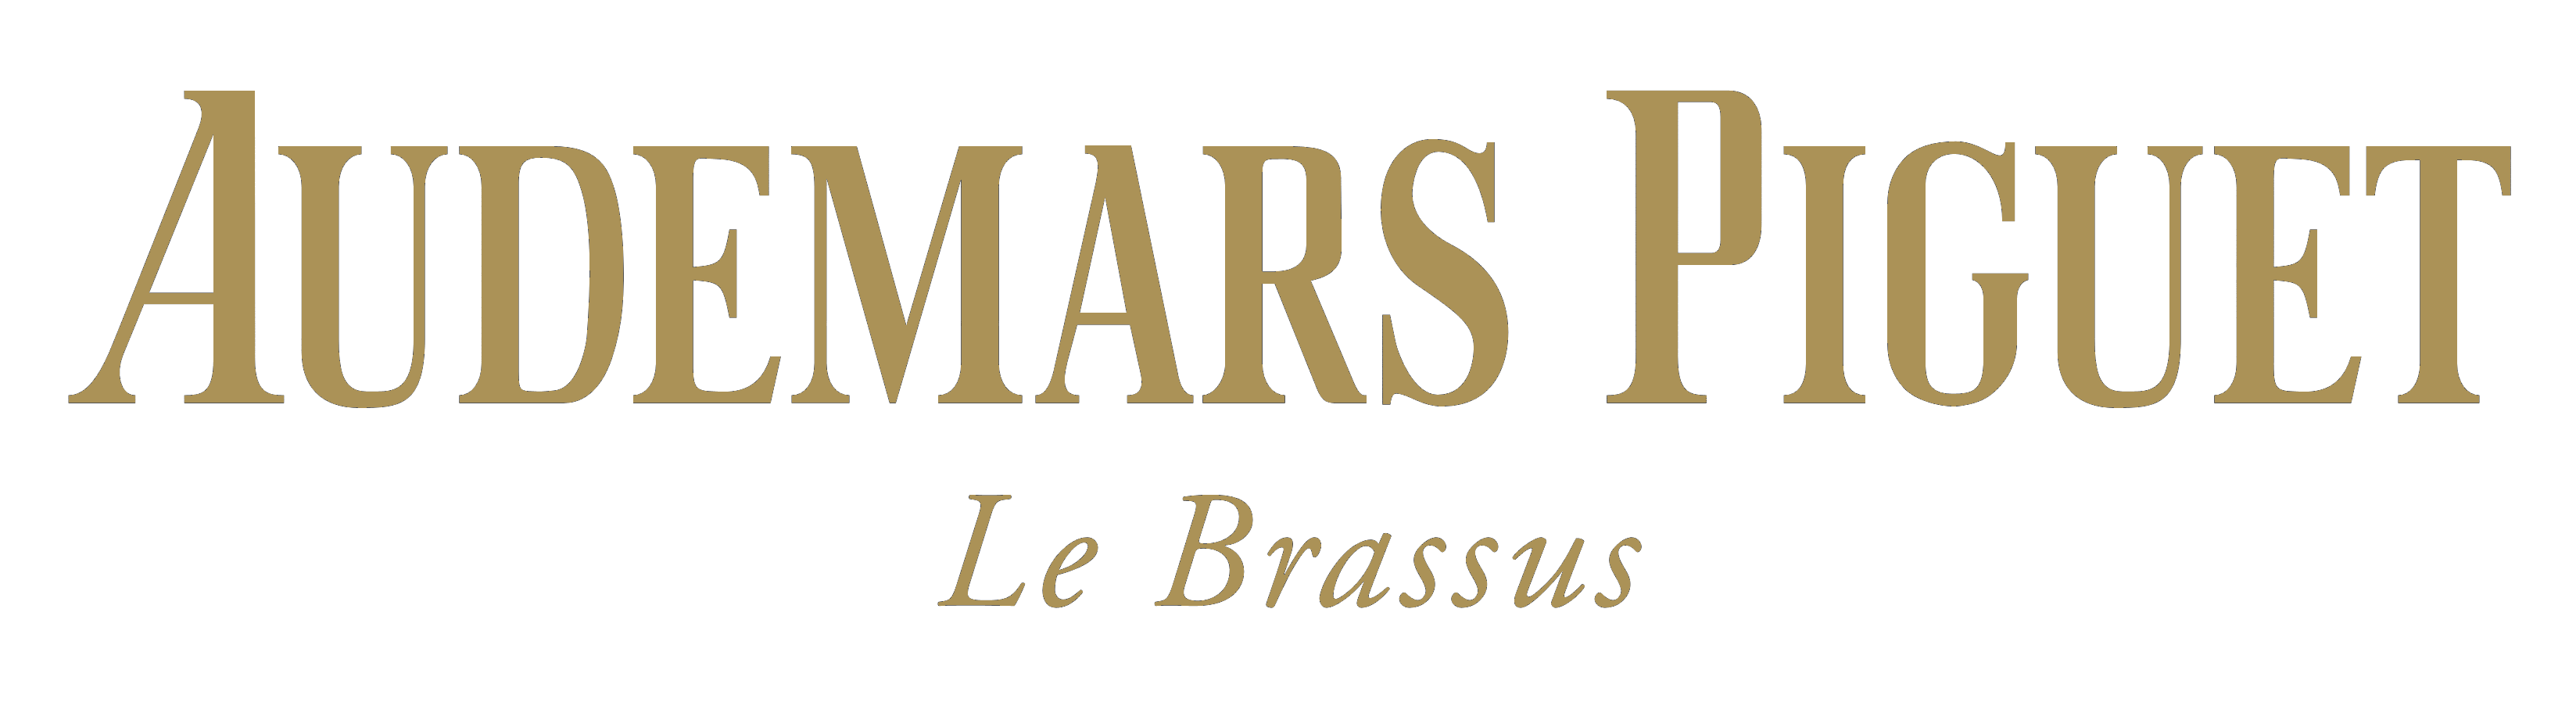 audemars_piguet_logo_logotype